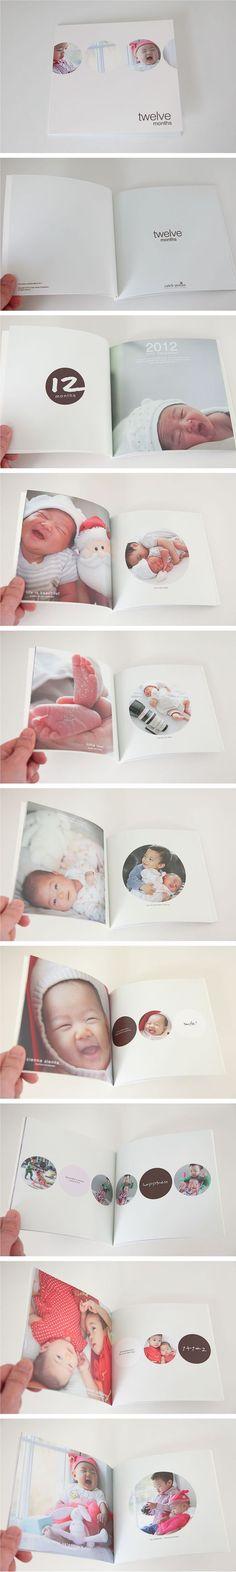 A clean and fun photobook design...: